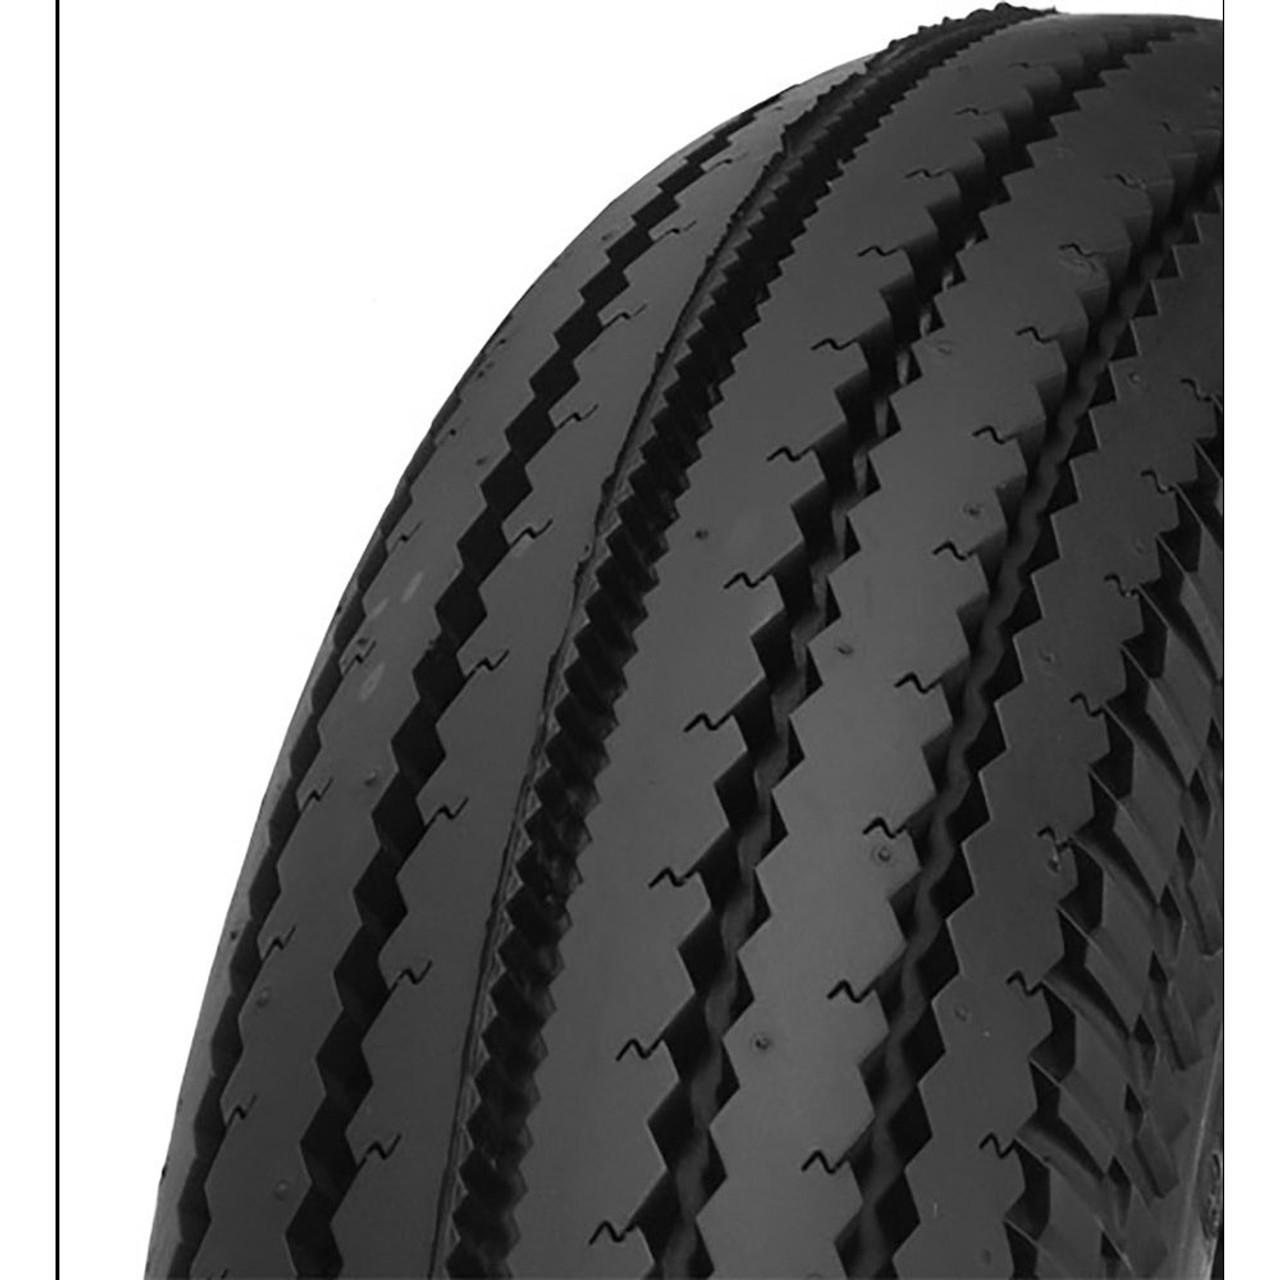 Shinko Super Classic 270 3.00-21 Front Bias Motorcycle Tire 57S 6PR TT